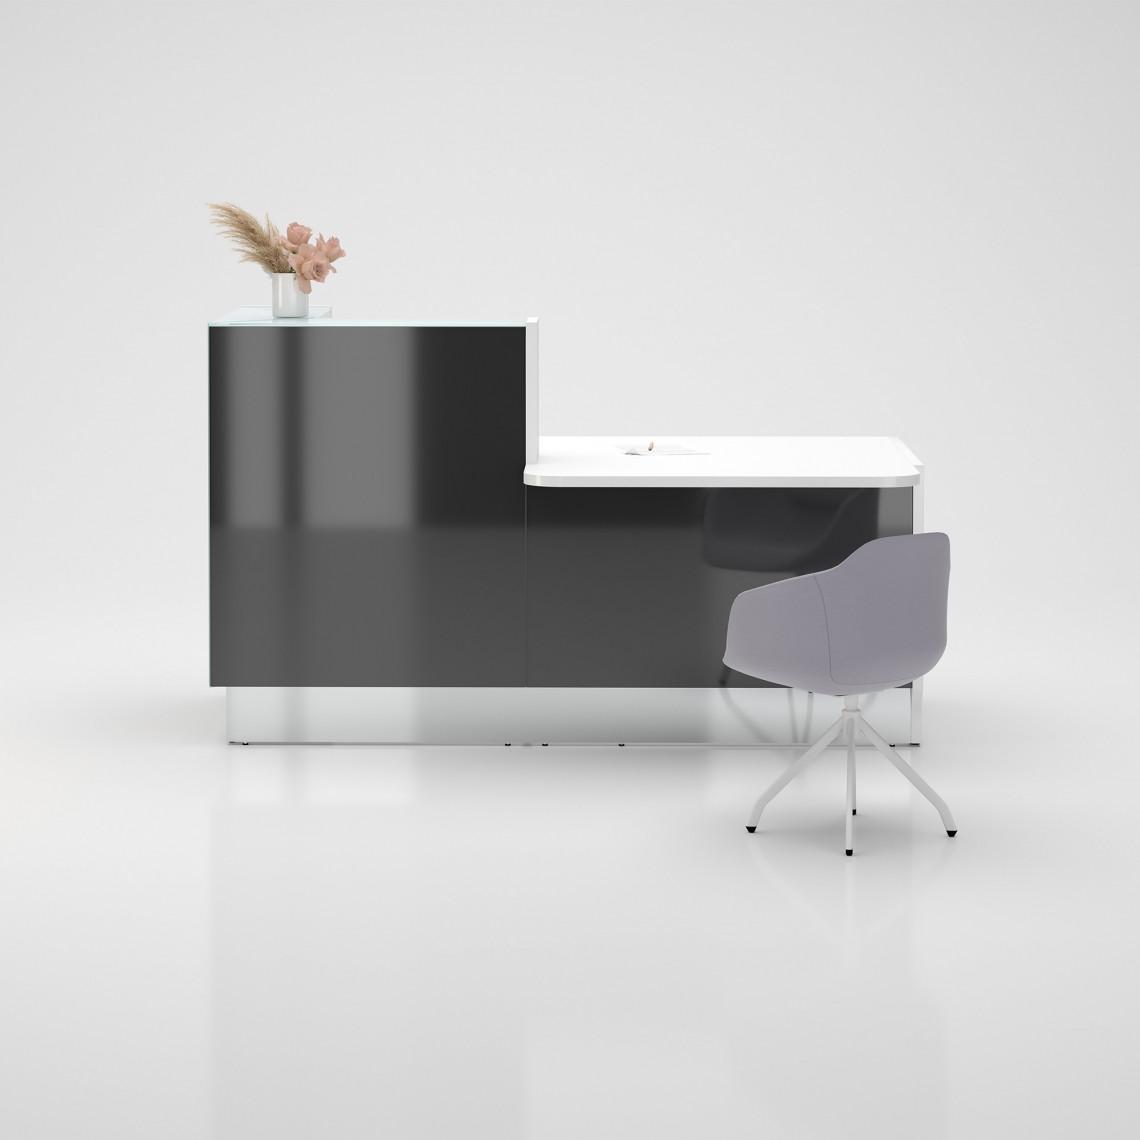 Receptionsdisk Linea Modell 3